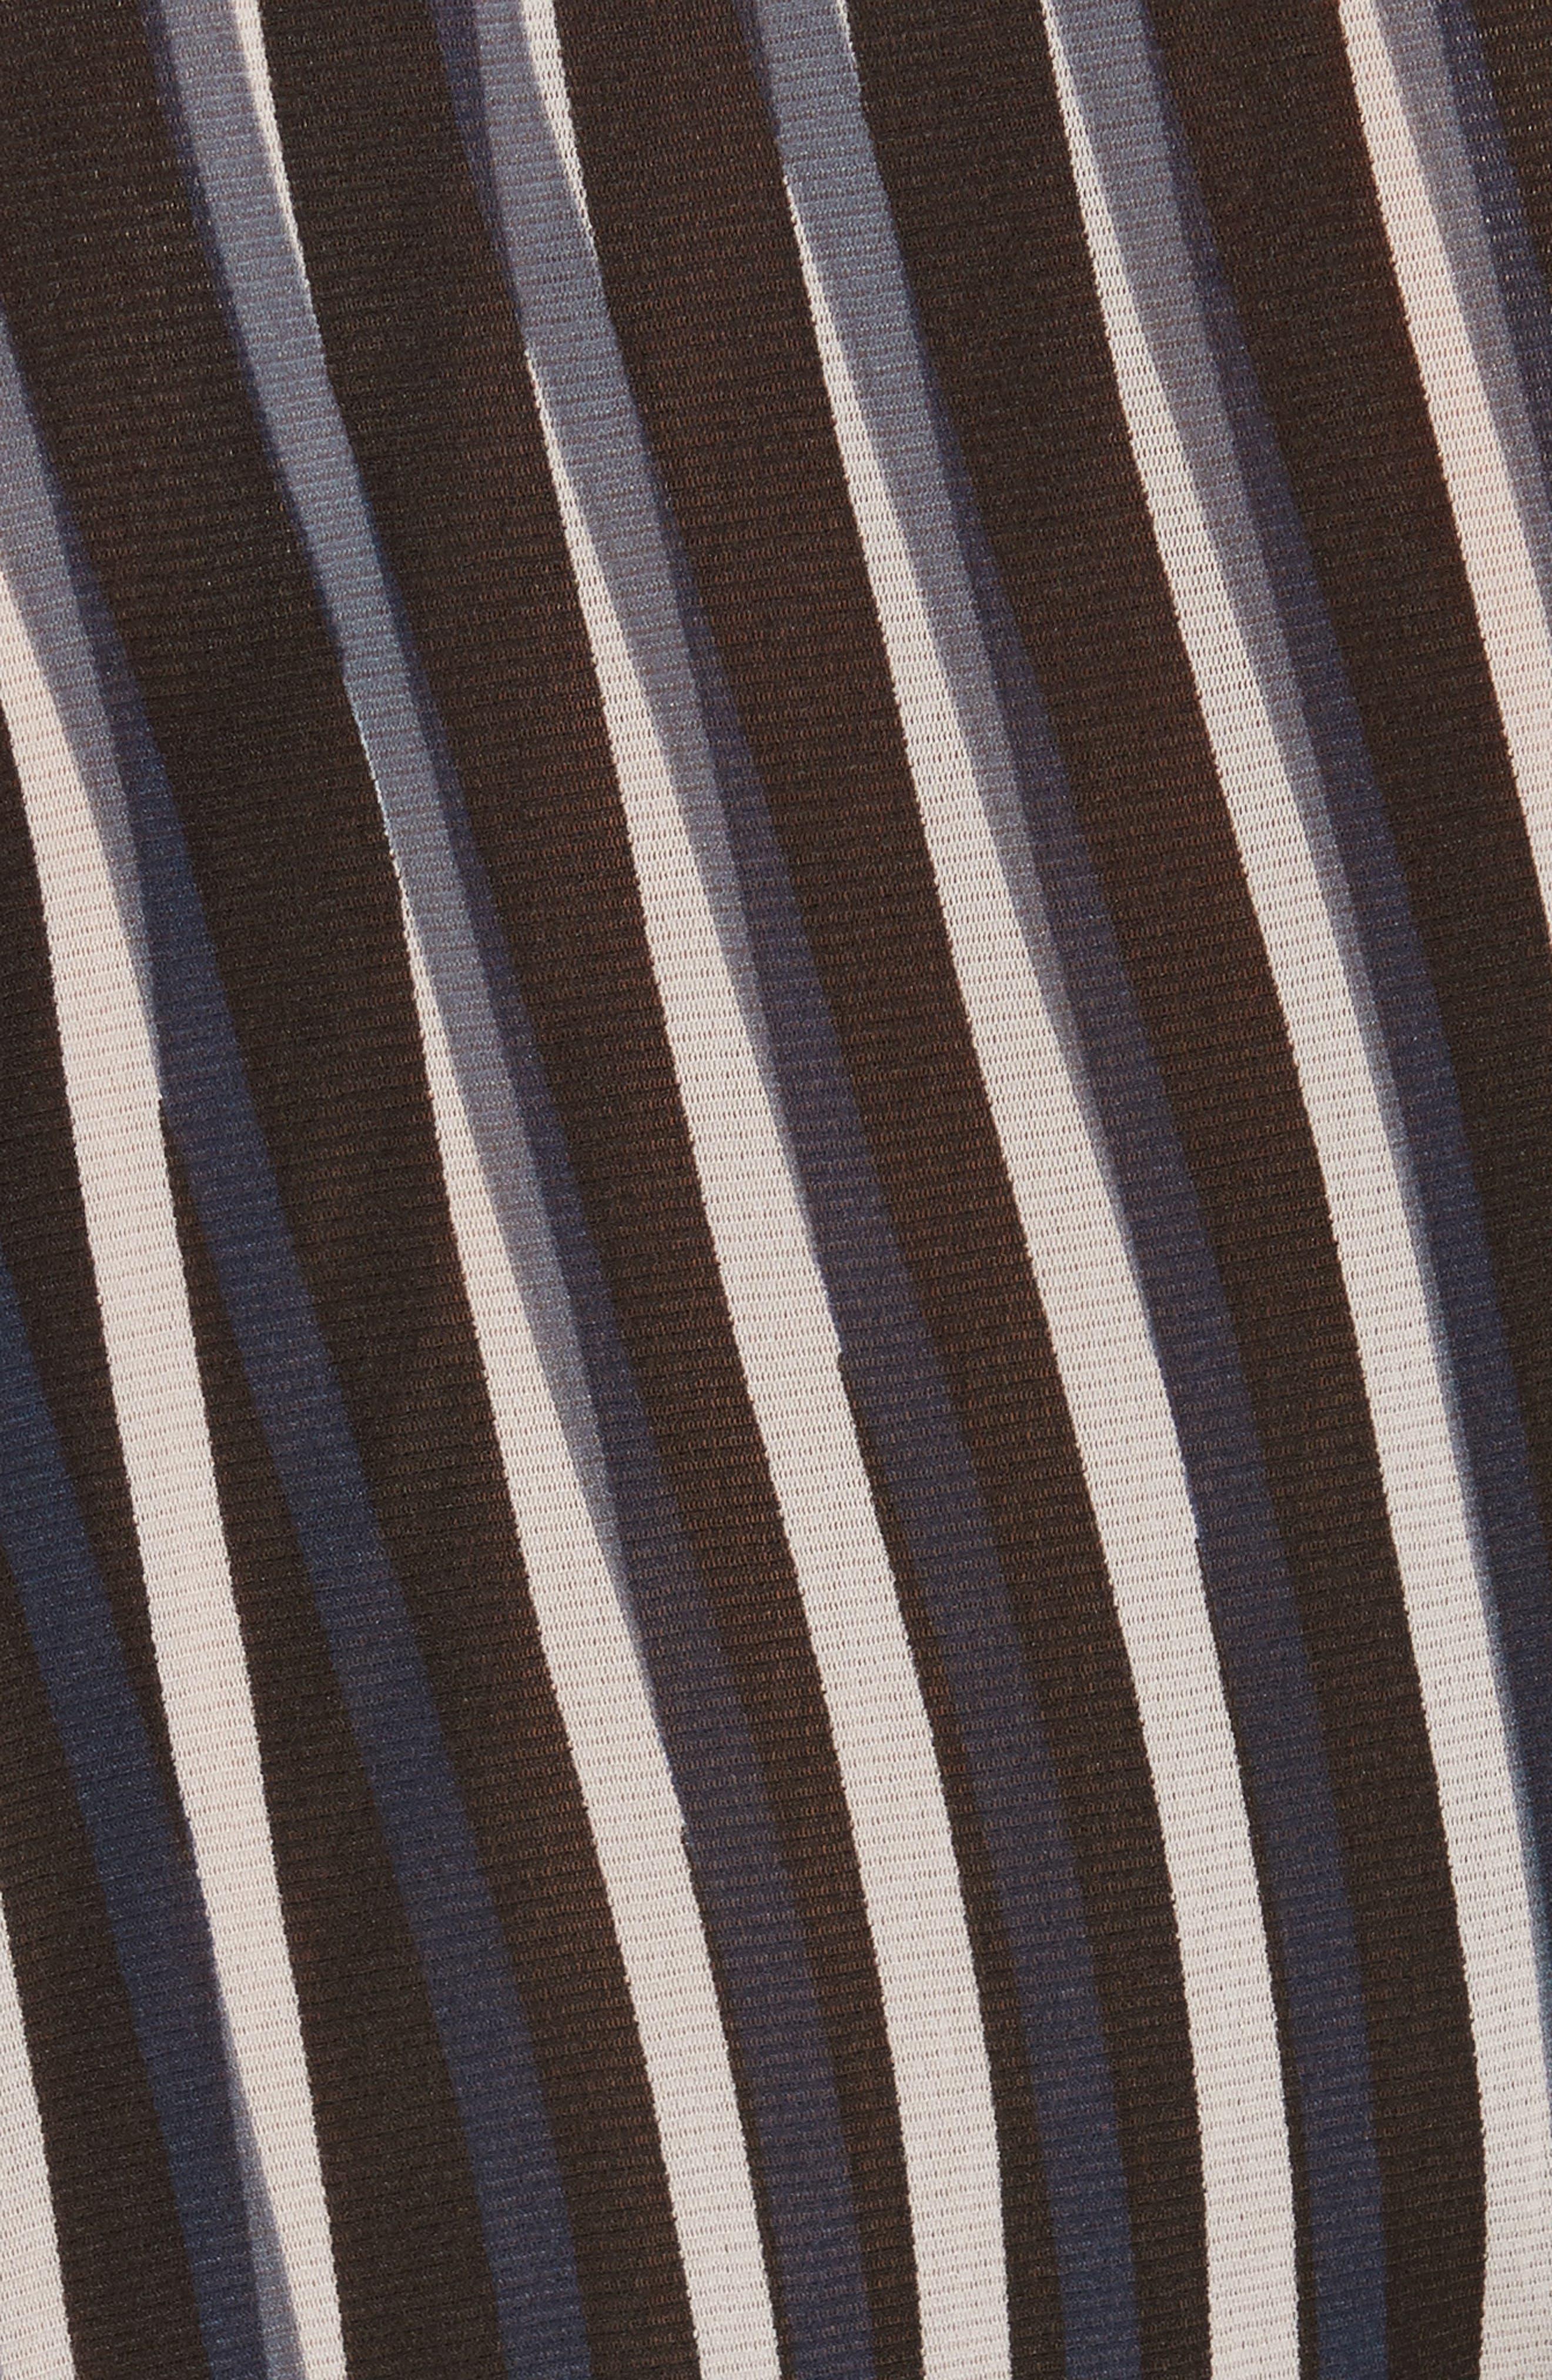 Diane von Furstenberg Fitted Print Top,                             Alternate thumbnail 5, color,                             004